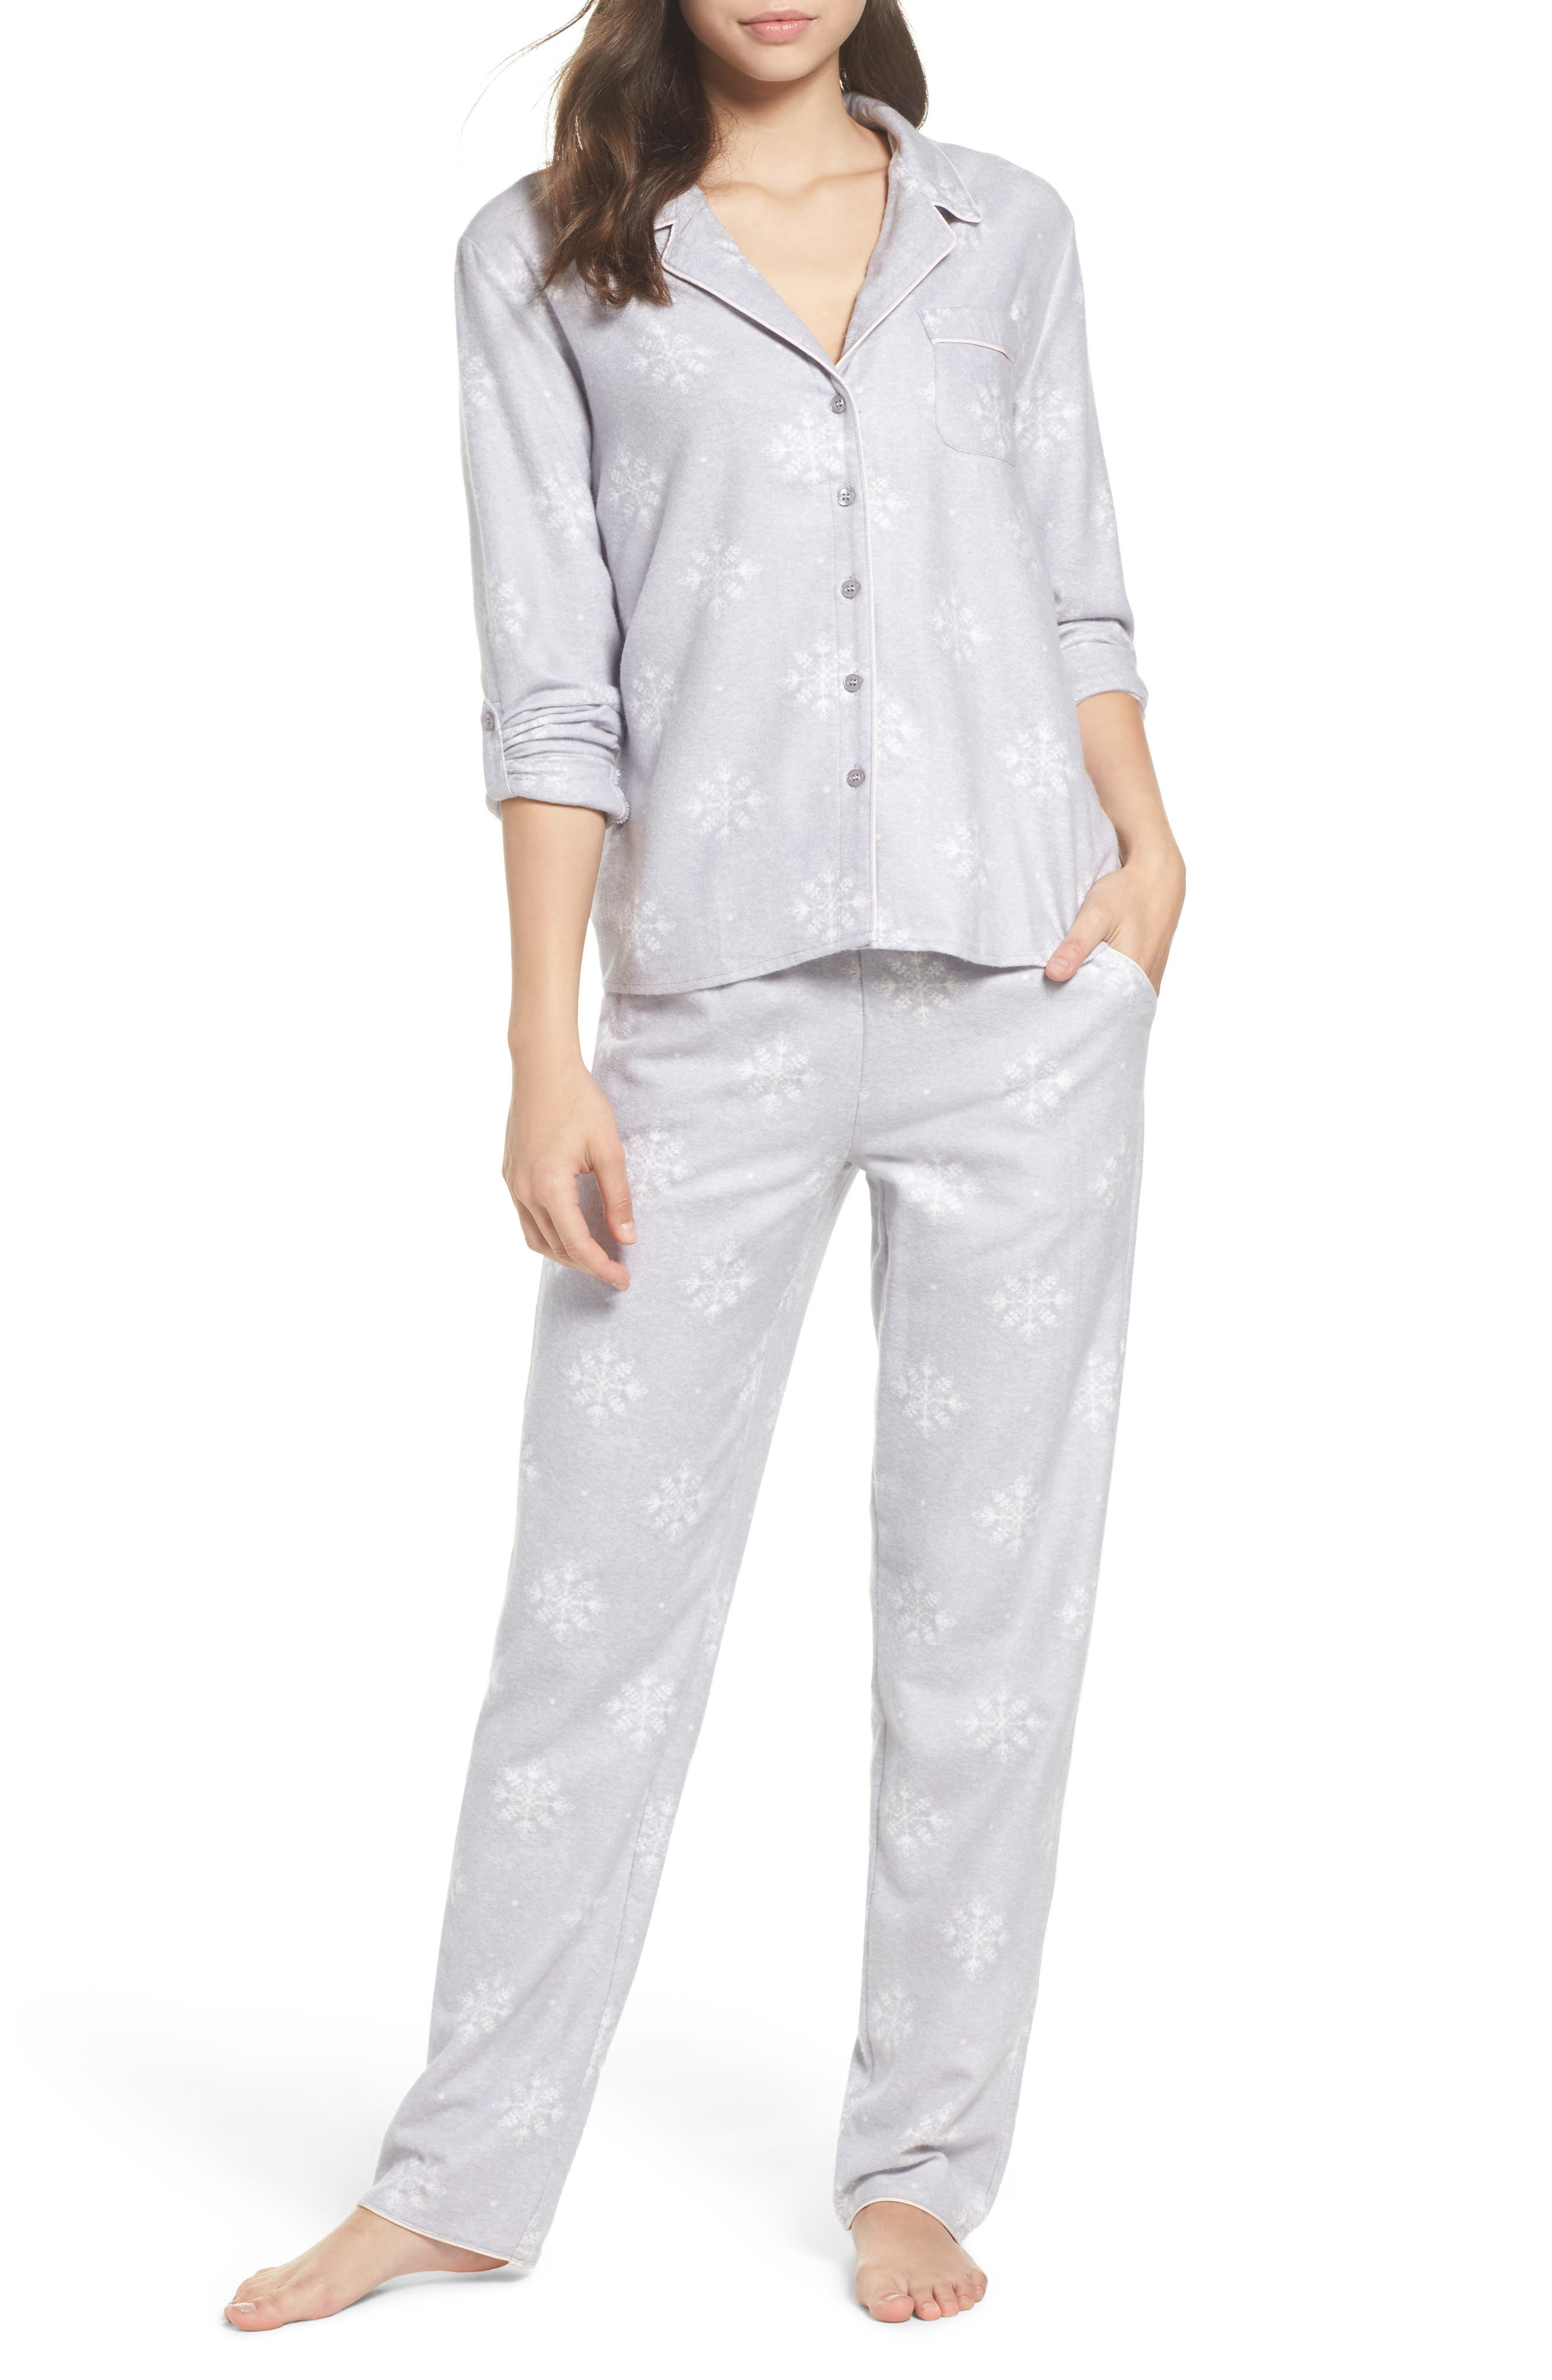 Lingerie Starlight Flannel Pajamas,                             Main thumbnail 1, color,